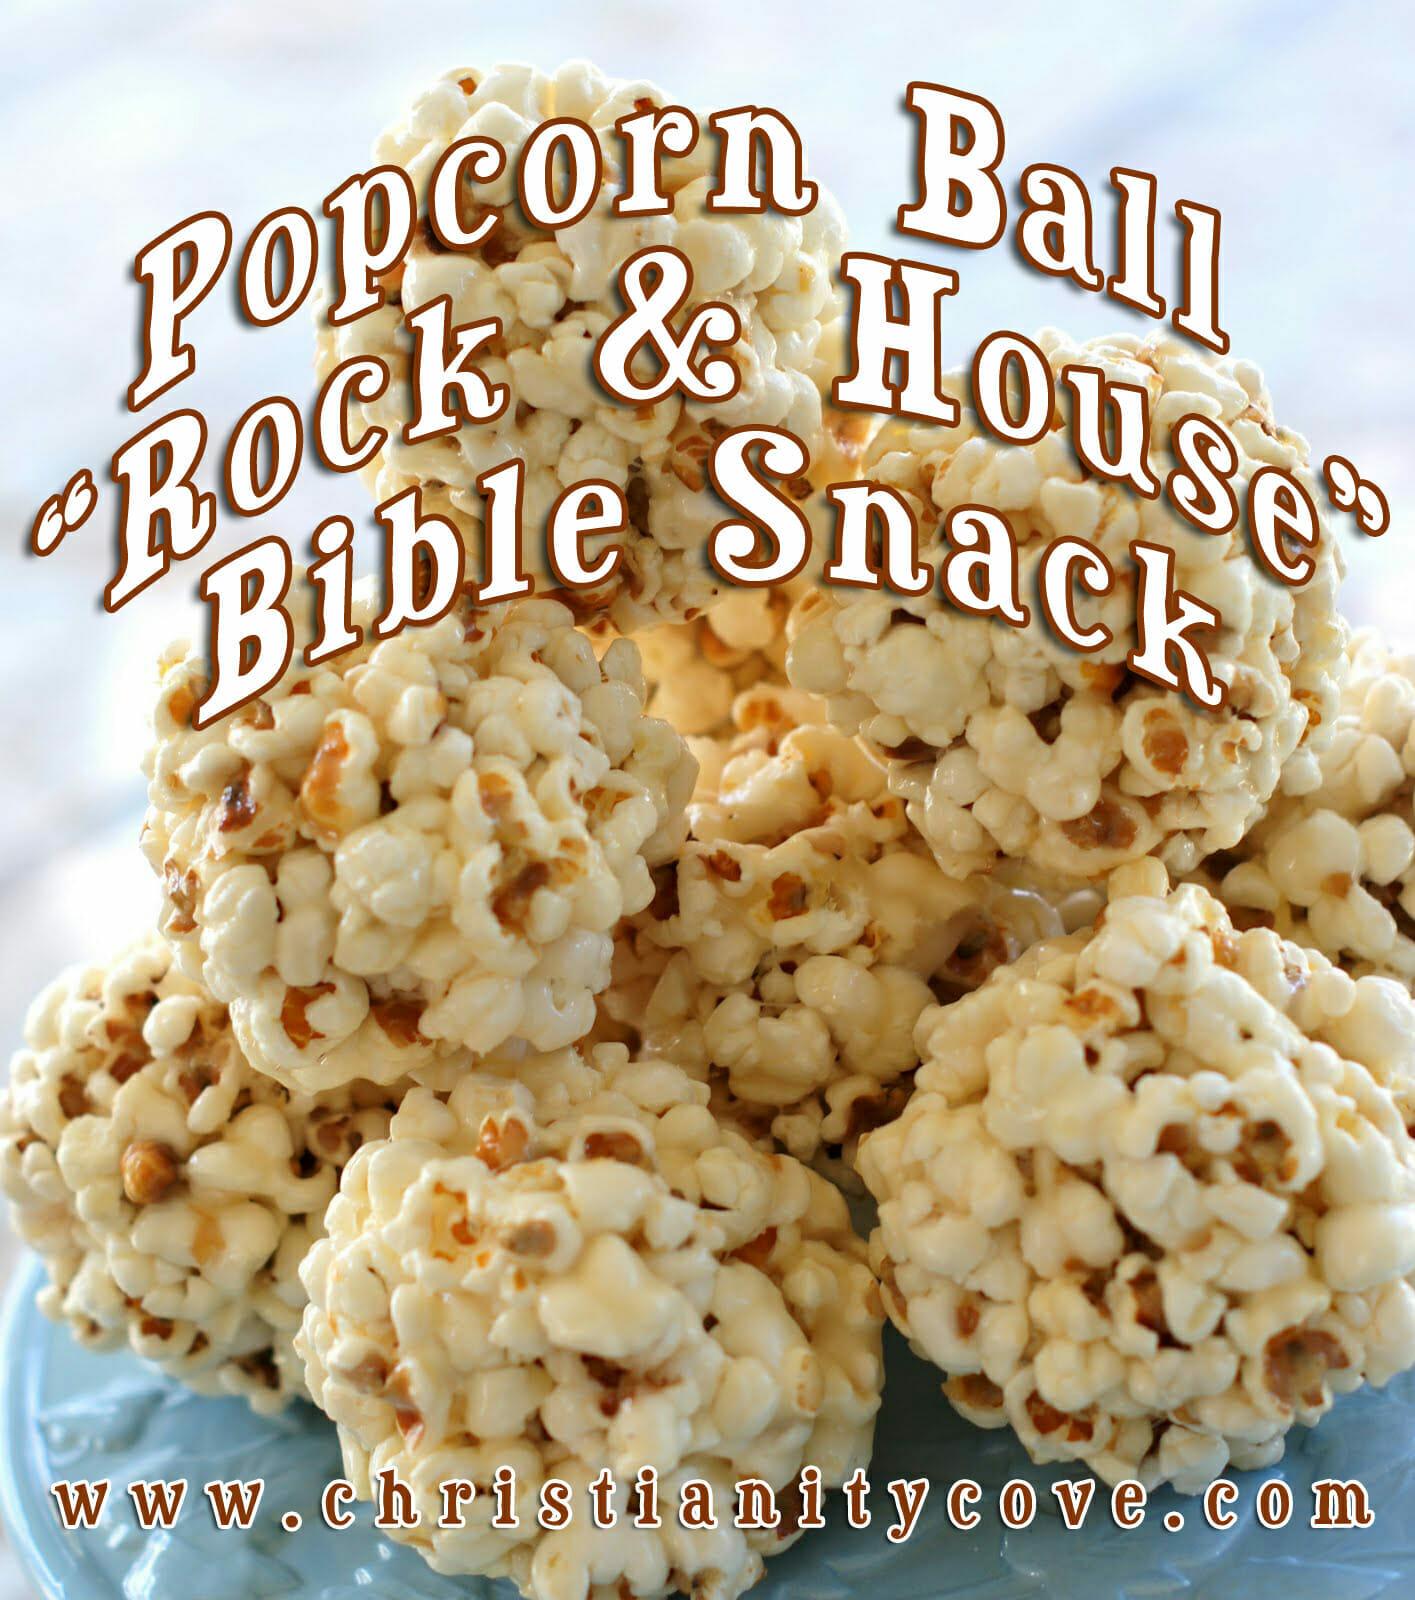 popcorn ball rock house bible snack